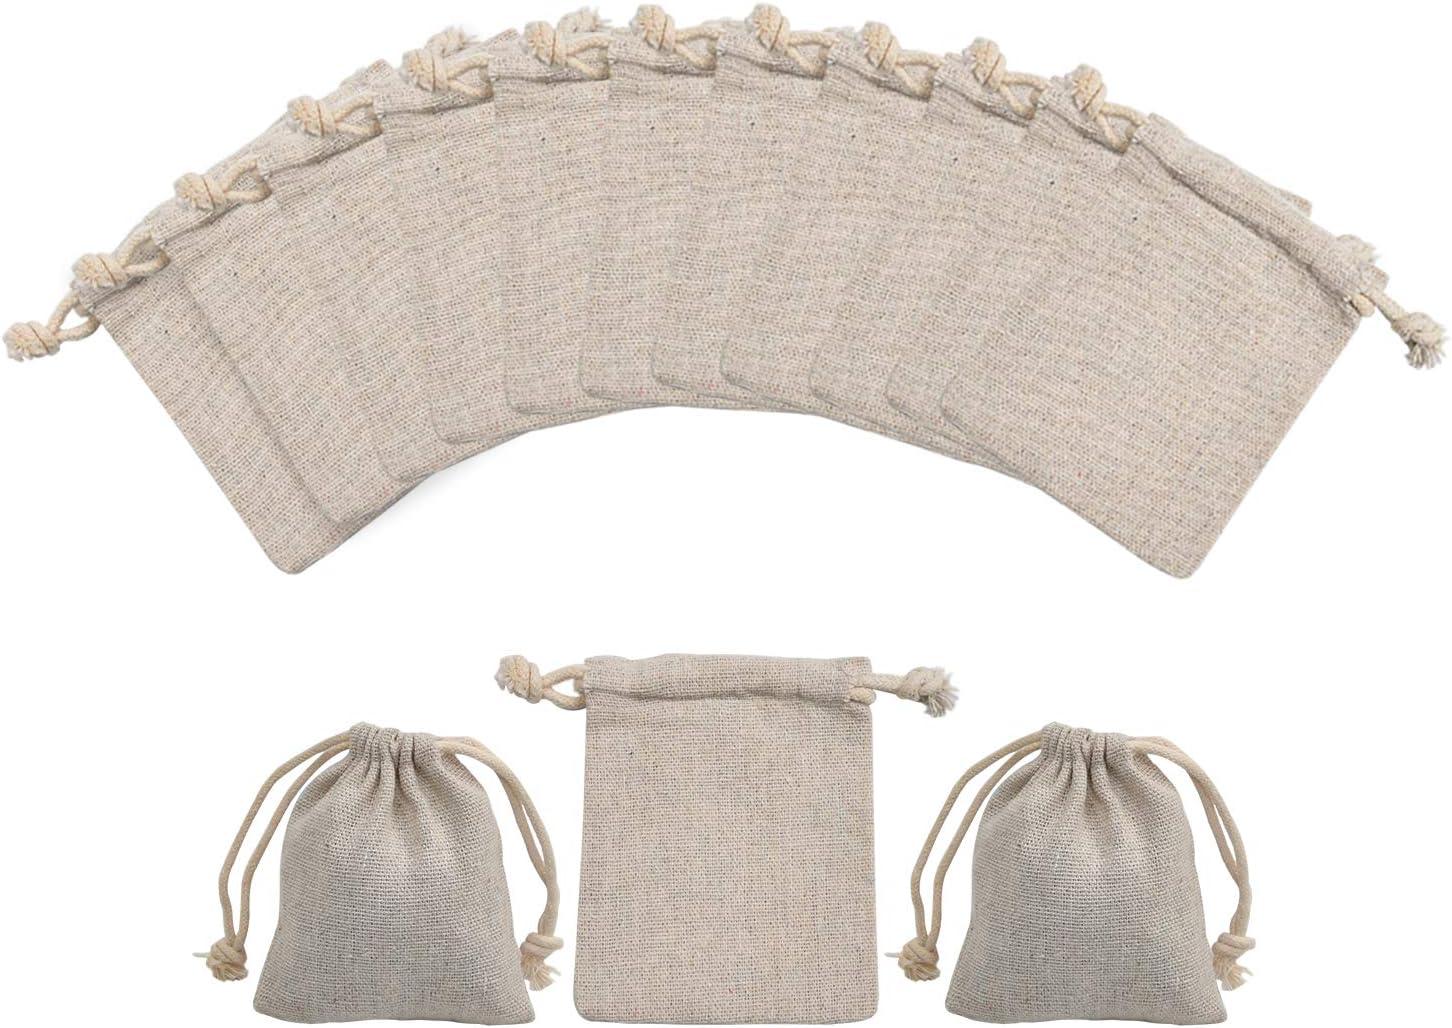 Calary 50pcs Double Canvas Drawstring Gift Bag Cotton Pouch Gift Sachet Bags Muslin Bag Reusable Tea Bag 5x7 Inch